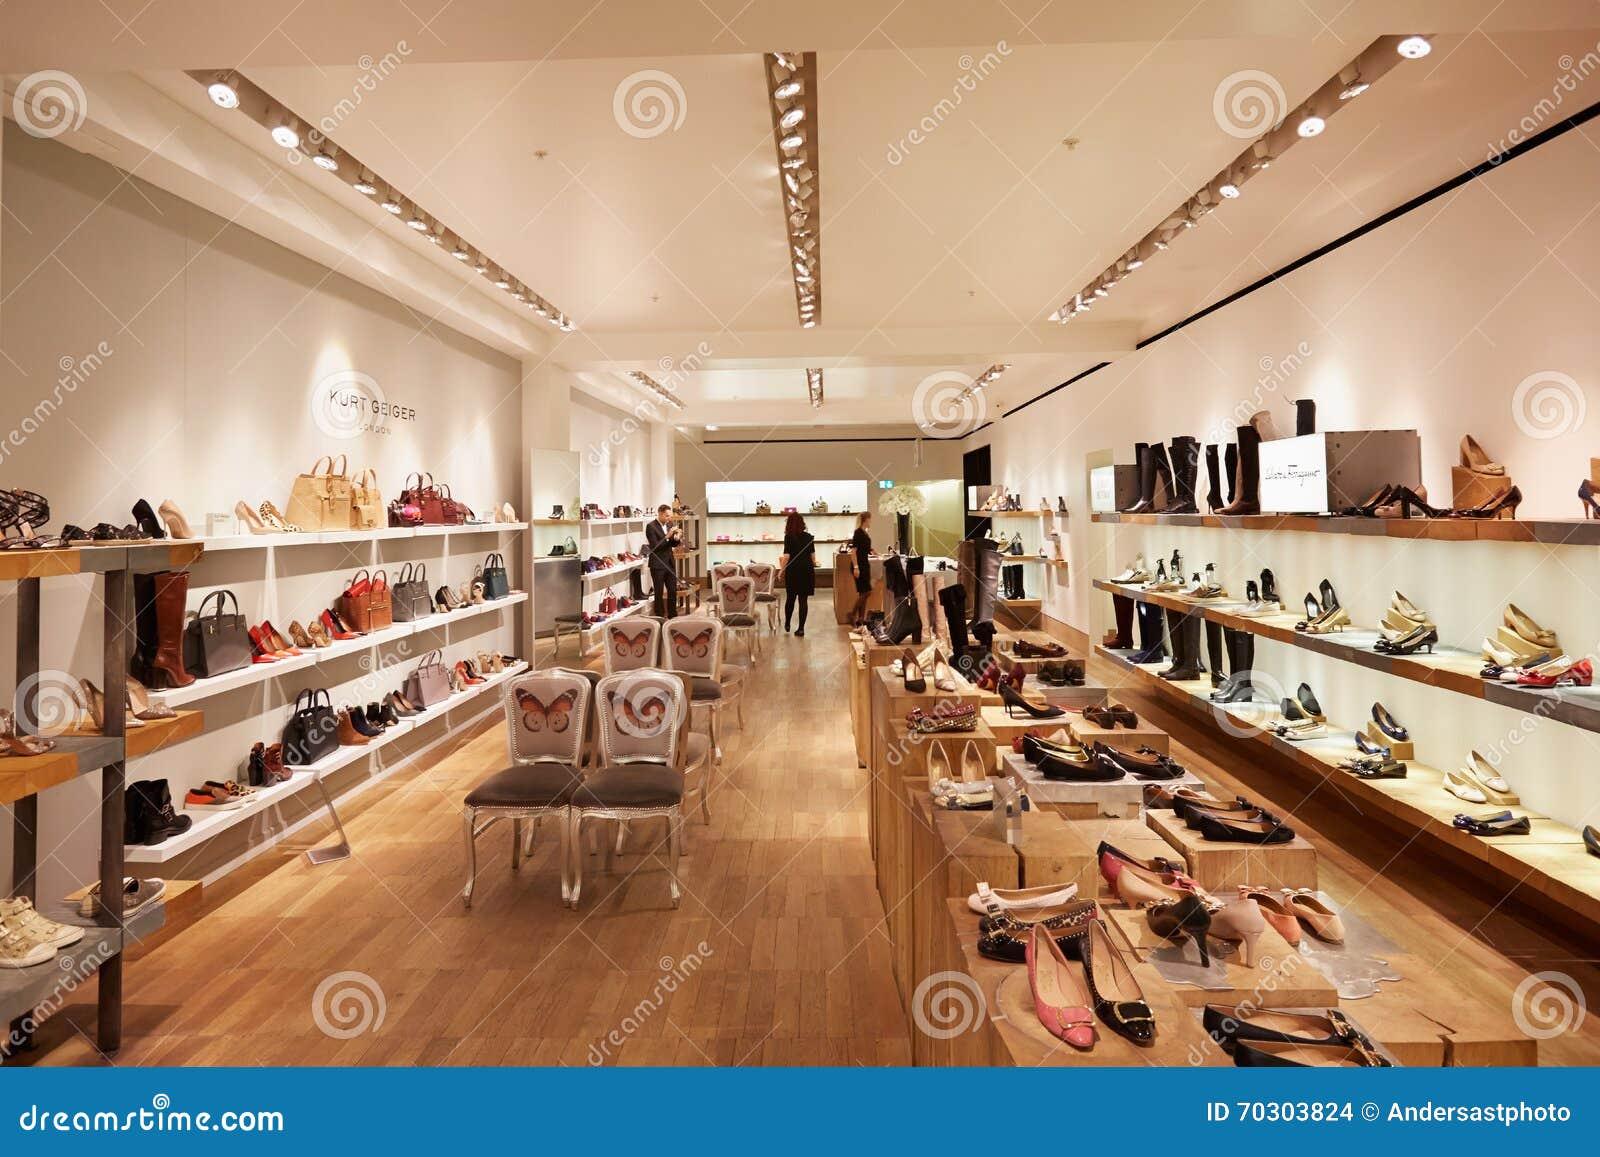 b2158ee8b918f Selfridges Department Store Interior